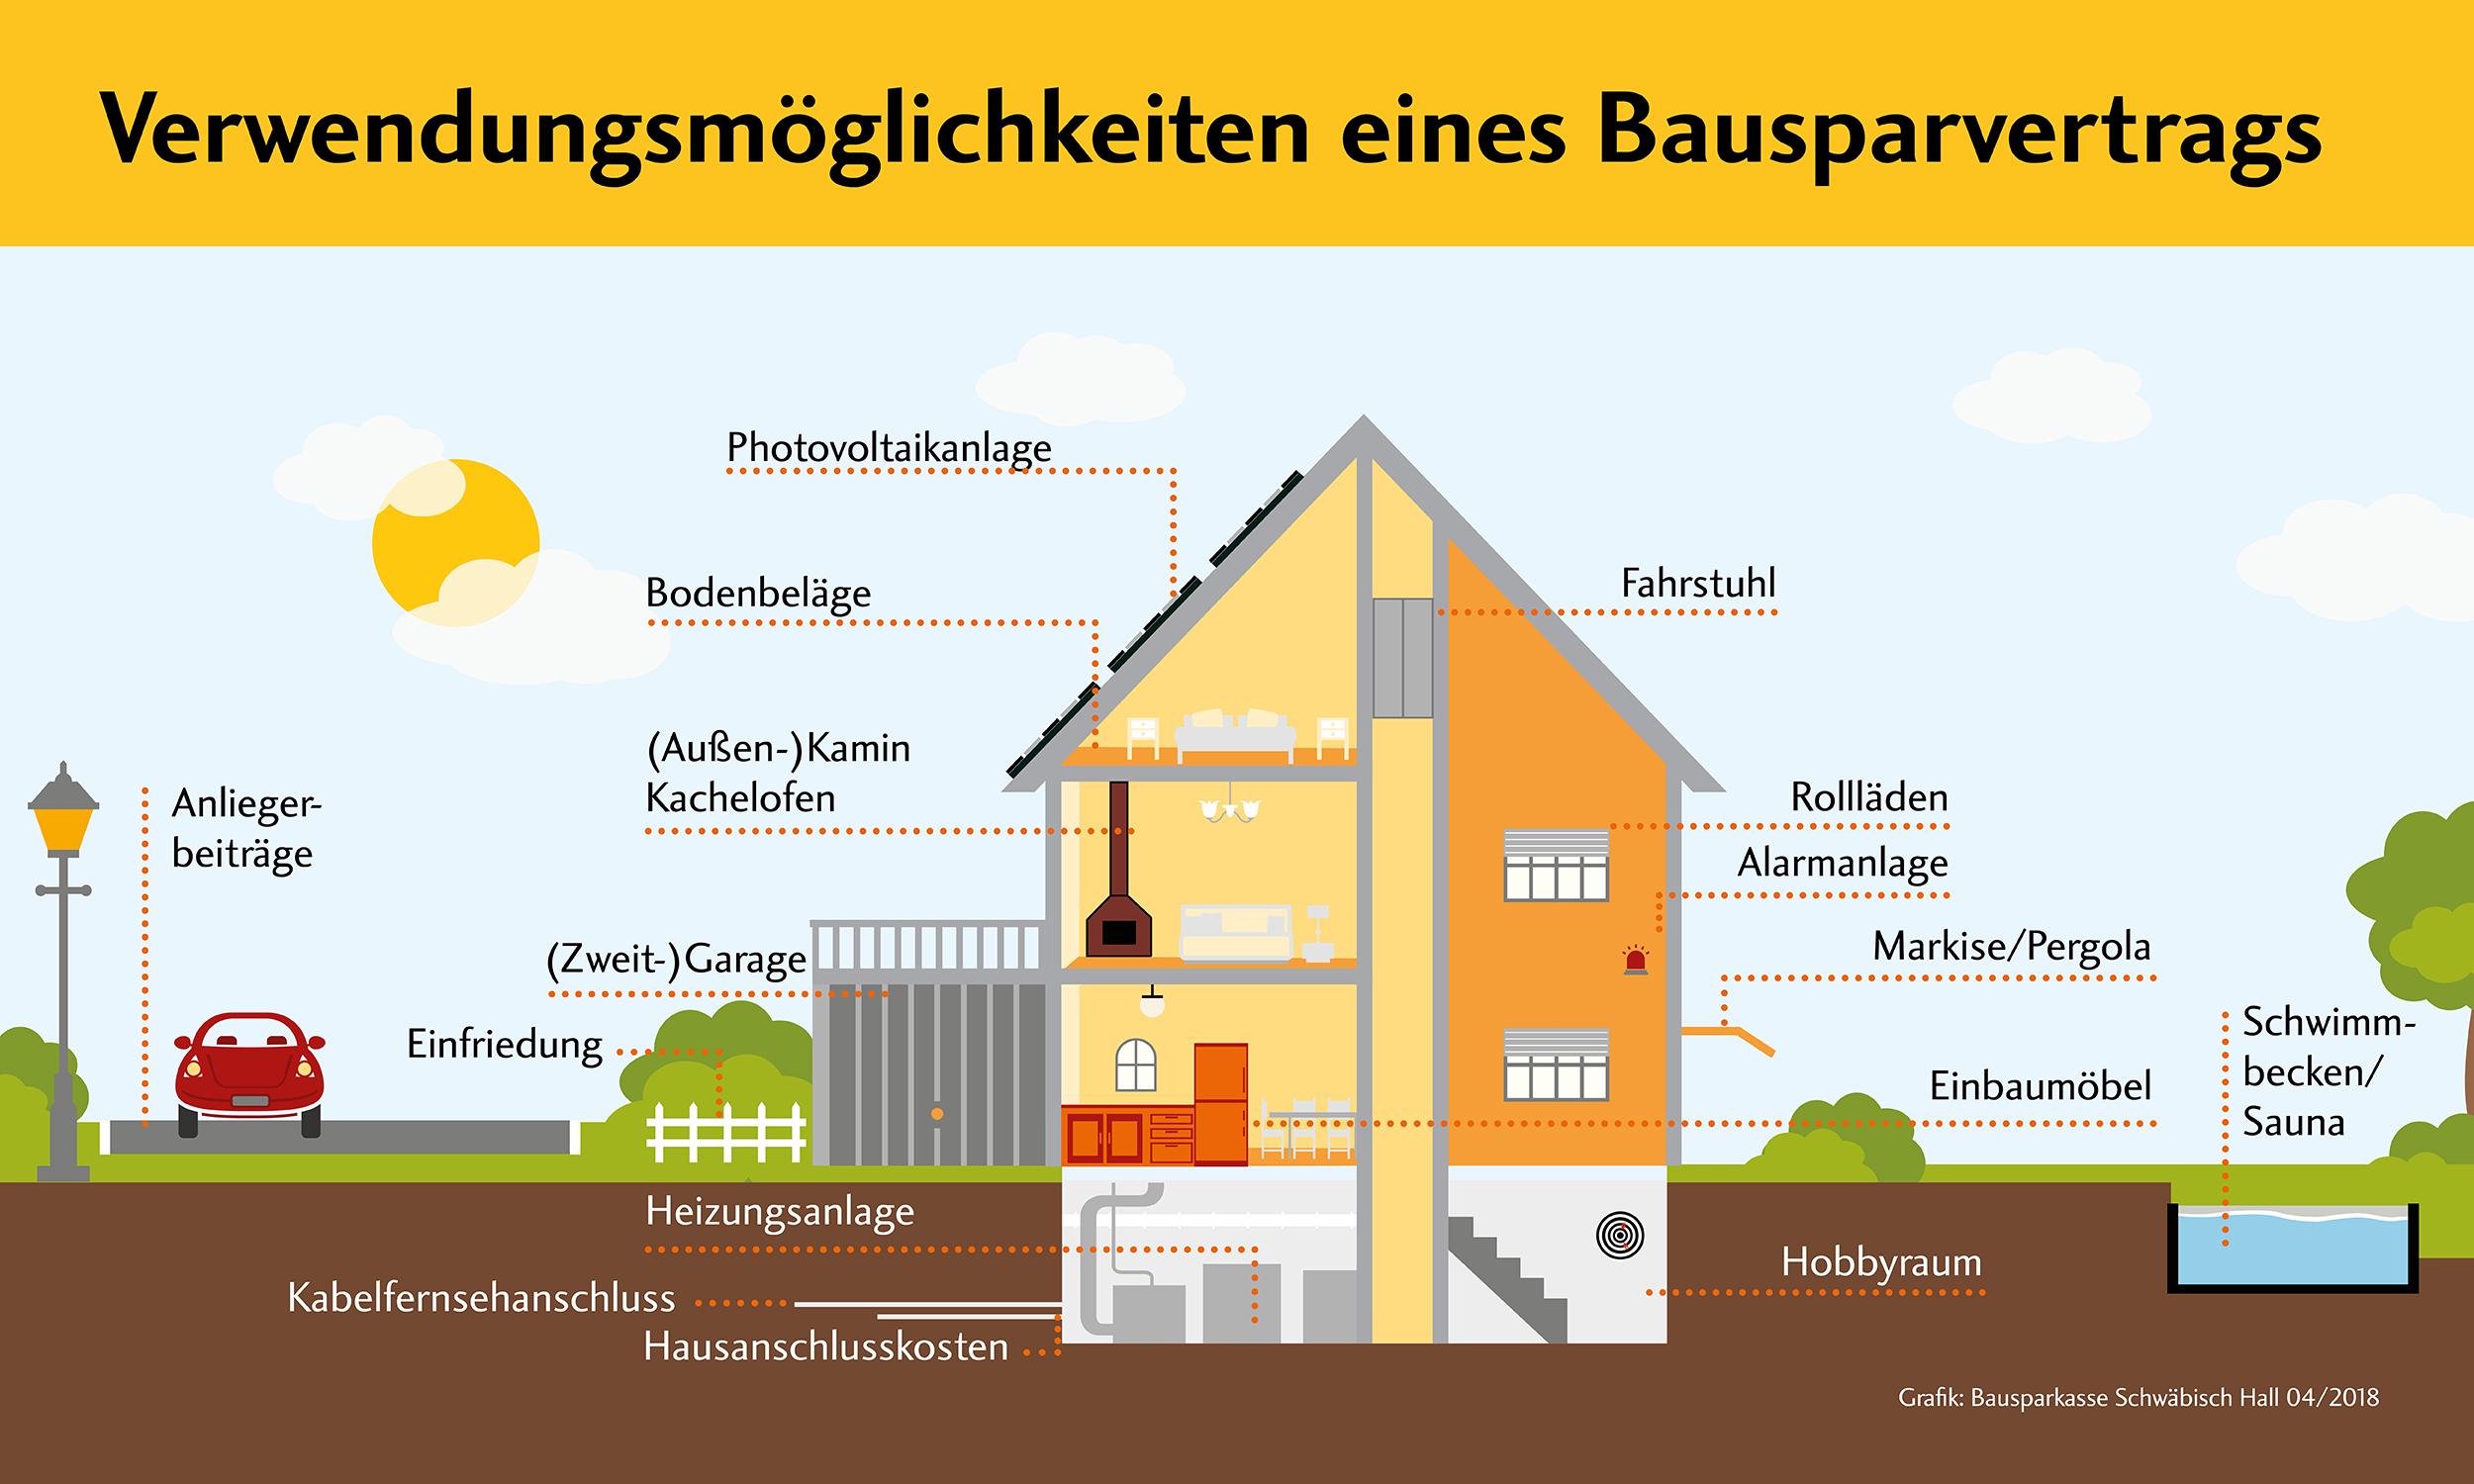 bausparvertrag ein allesk nner hinweise der volksbank l bbecker land. Black Bedroom Furniture Sets. Home Design Ideas